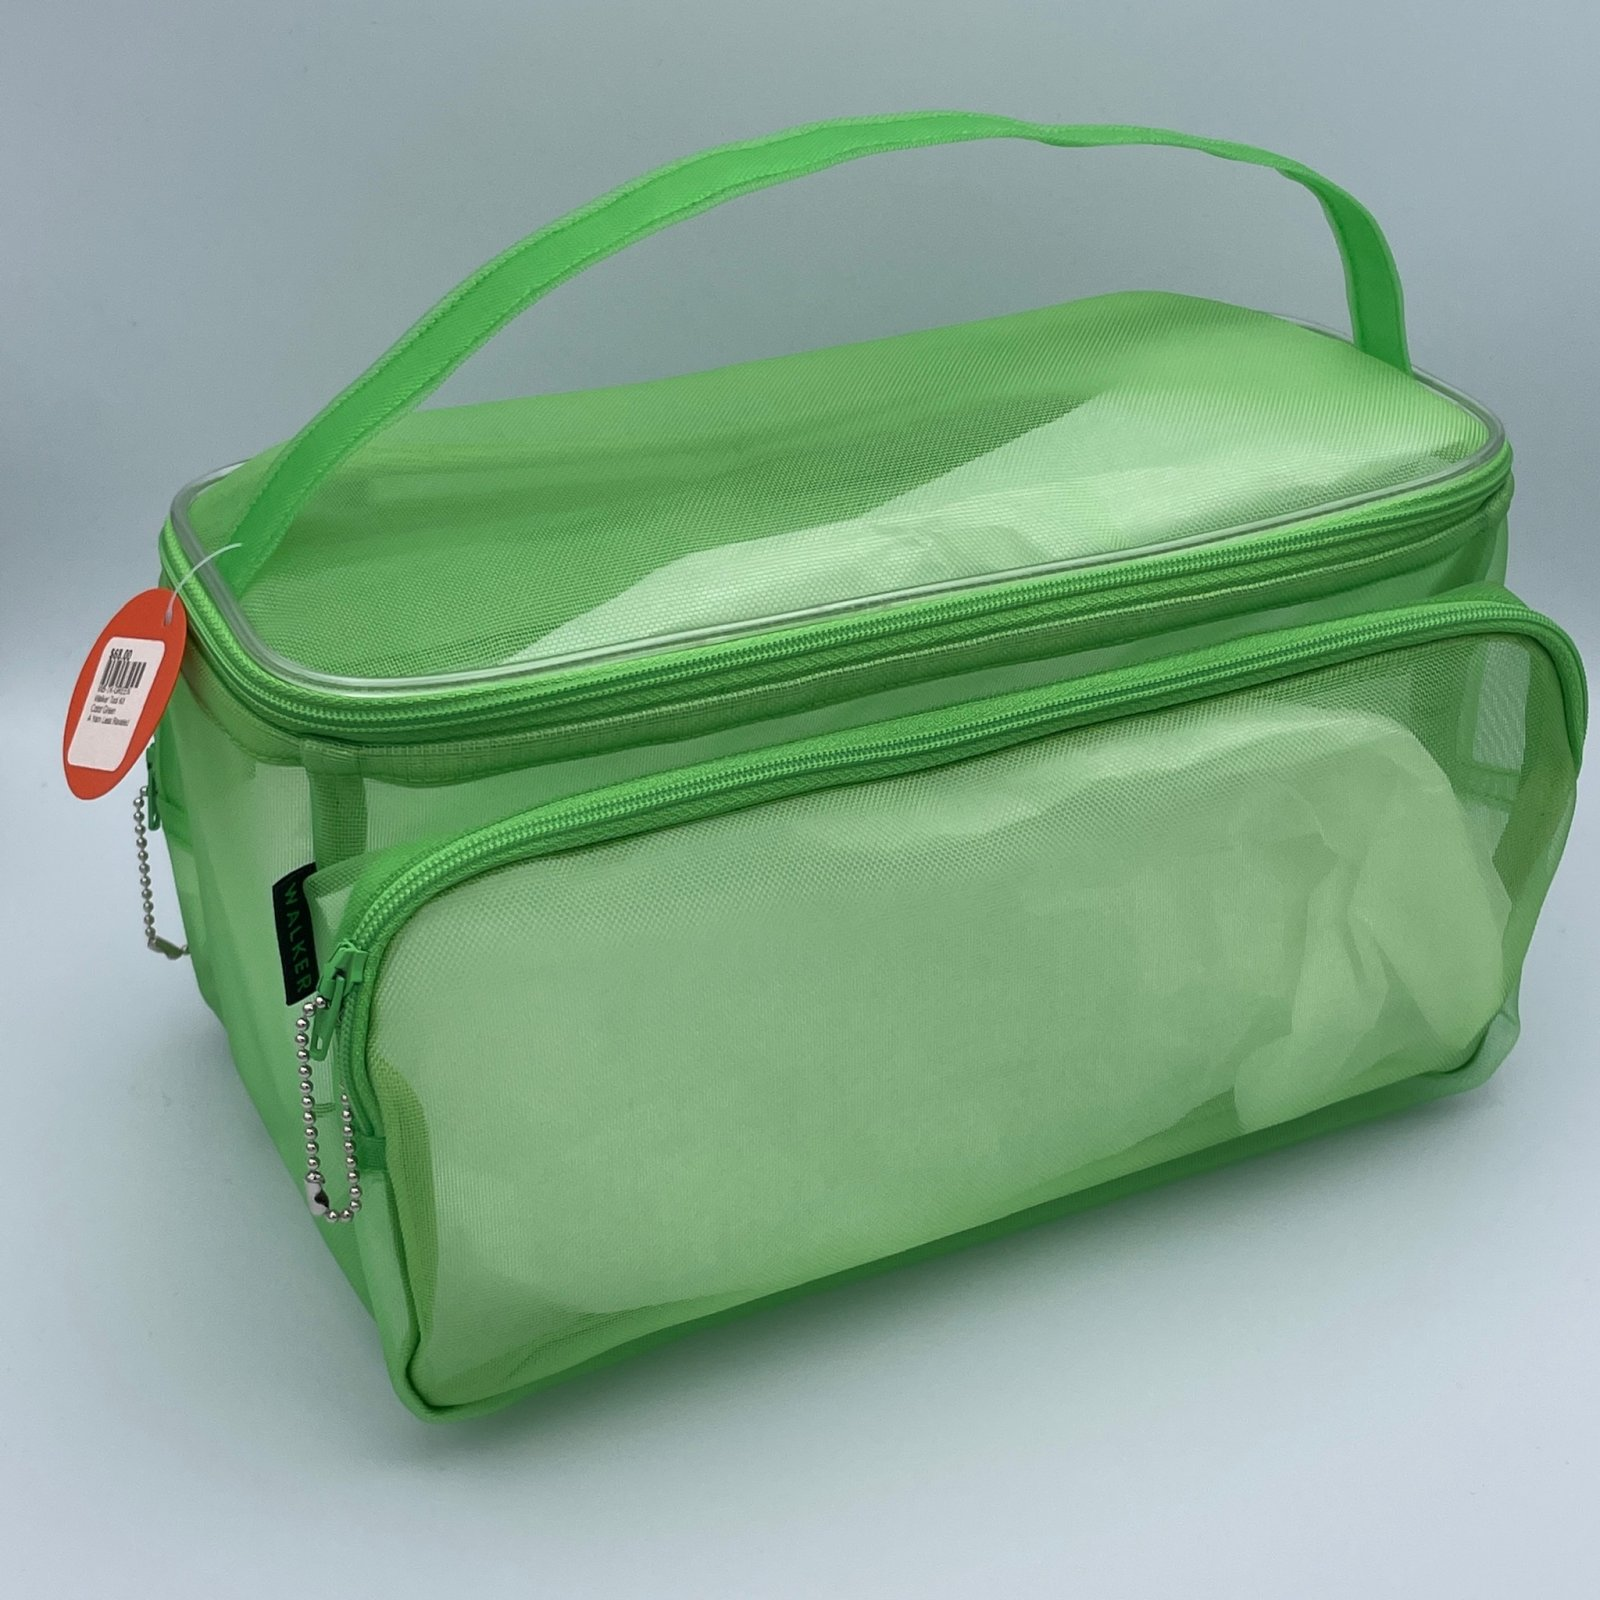 Walker Bag - Tool Kit